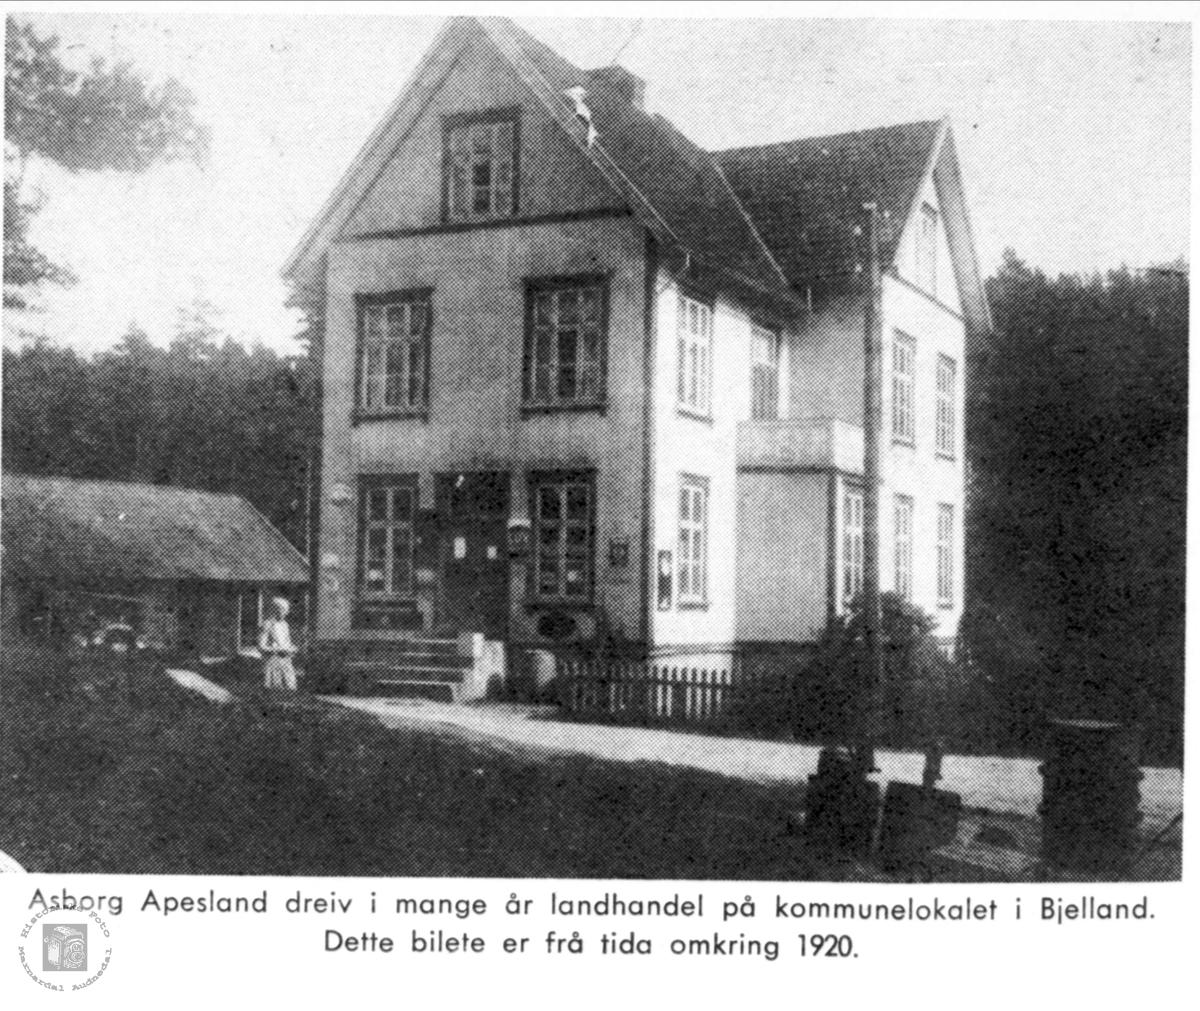 Kommunelokalet i Bjelland.